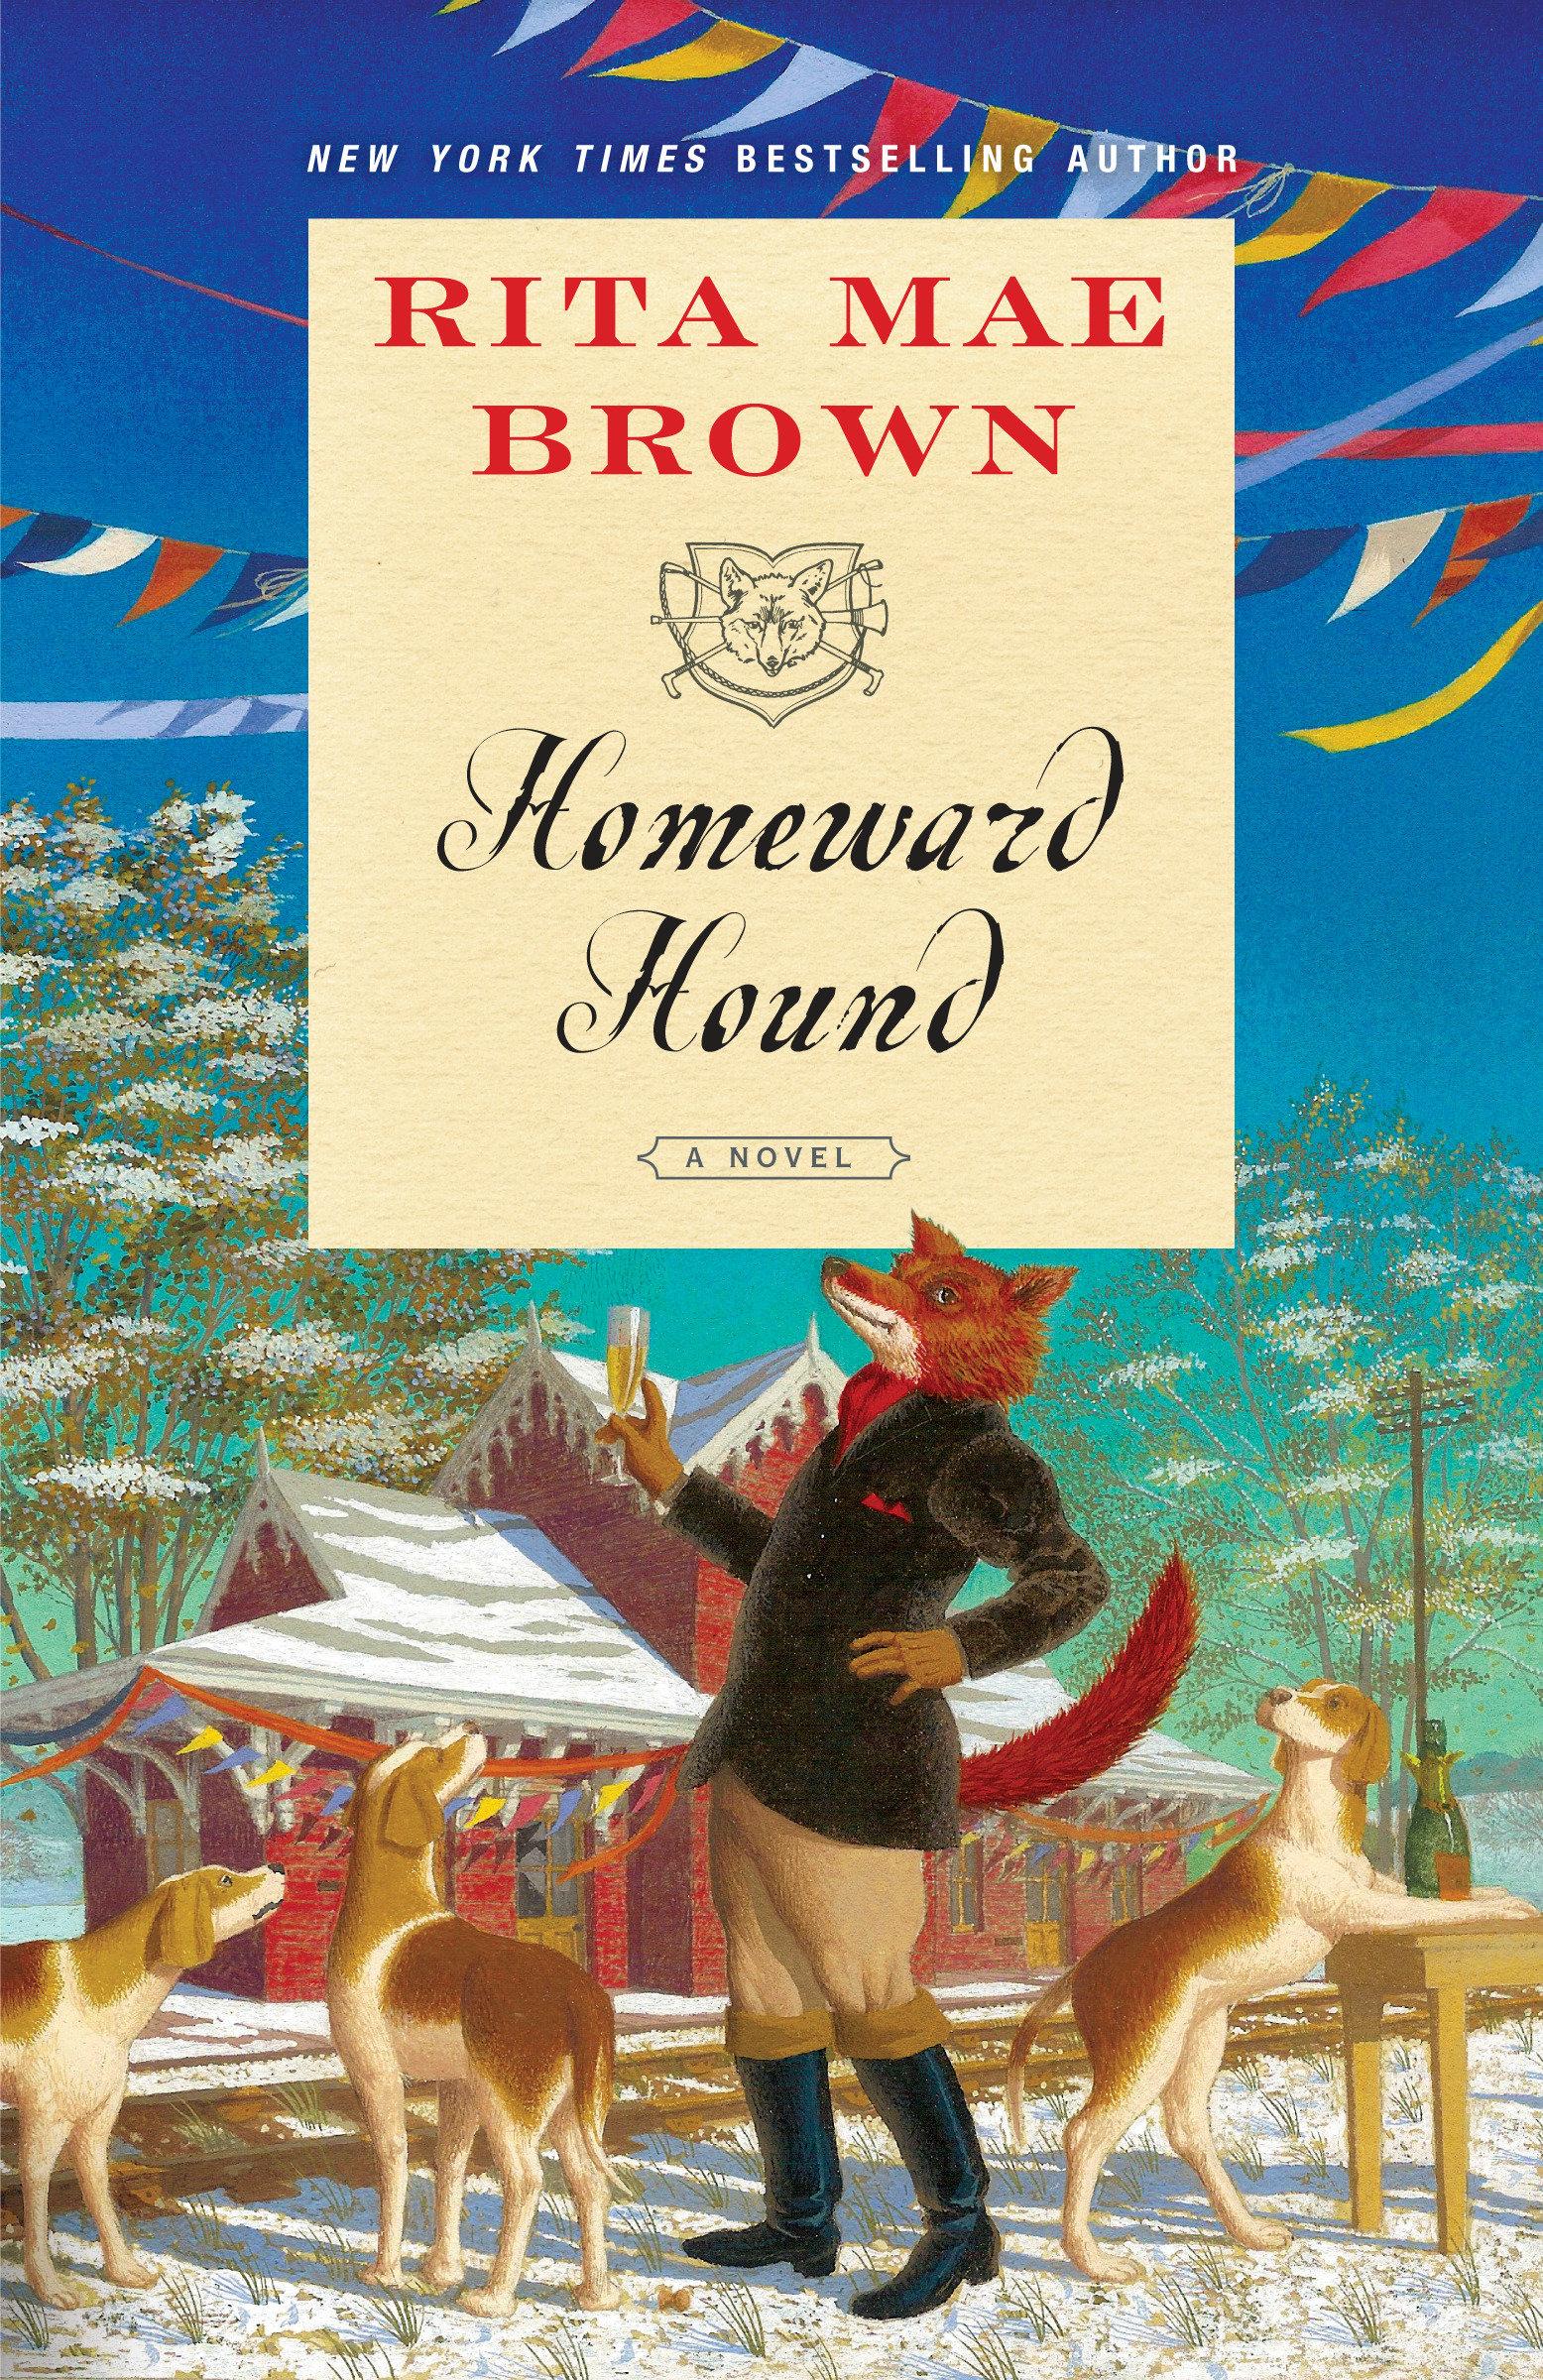 Homeward hound : a novel